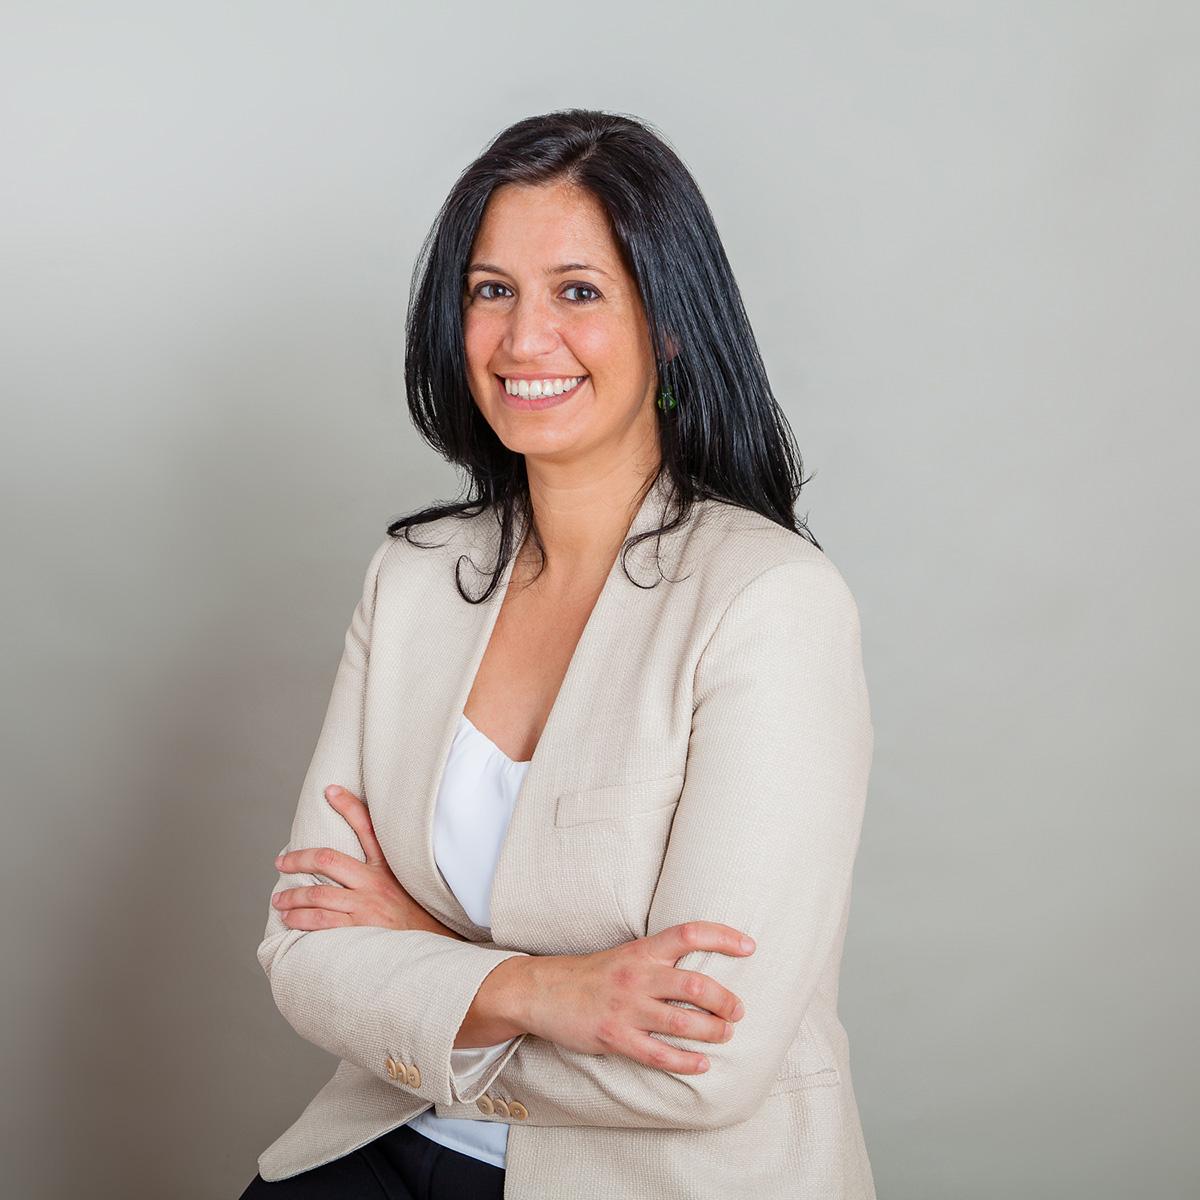 Amalia López Acera social networks